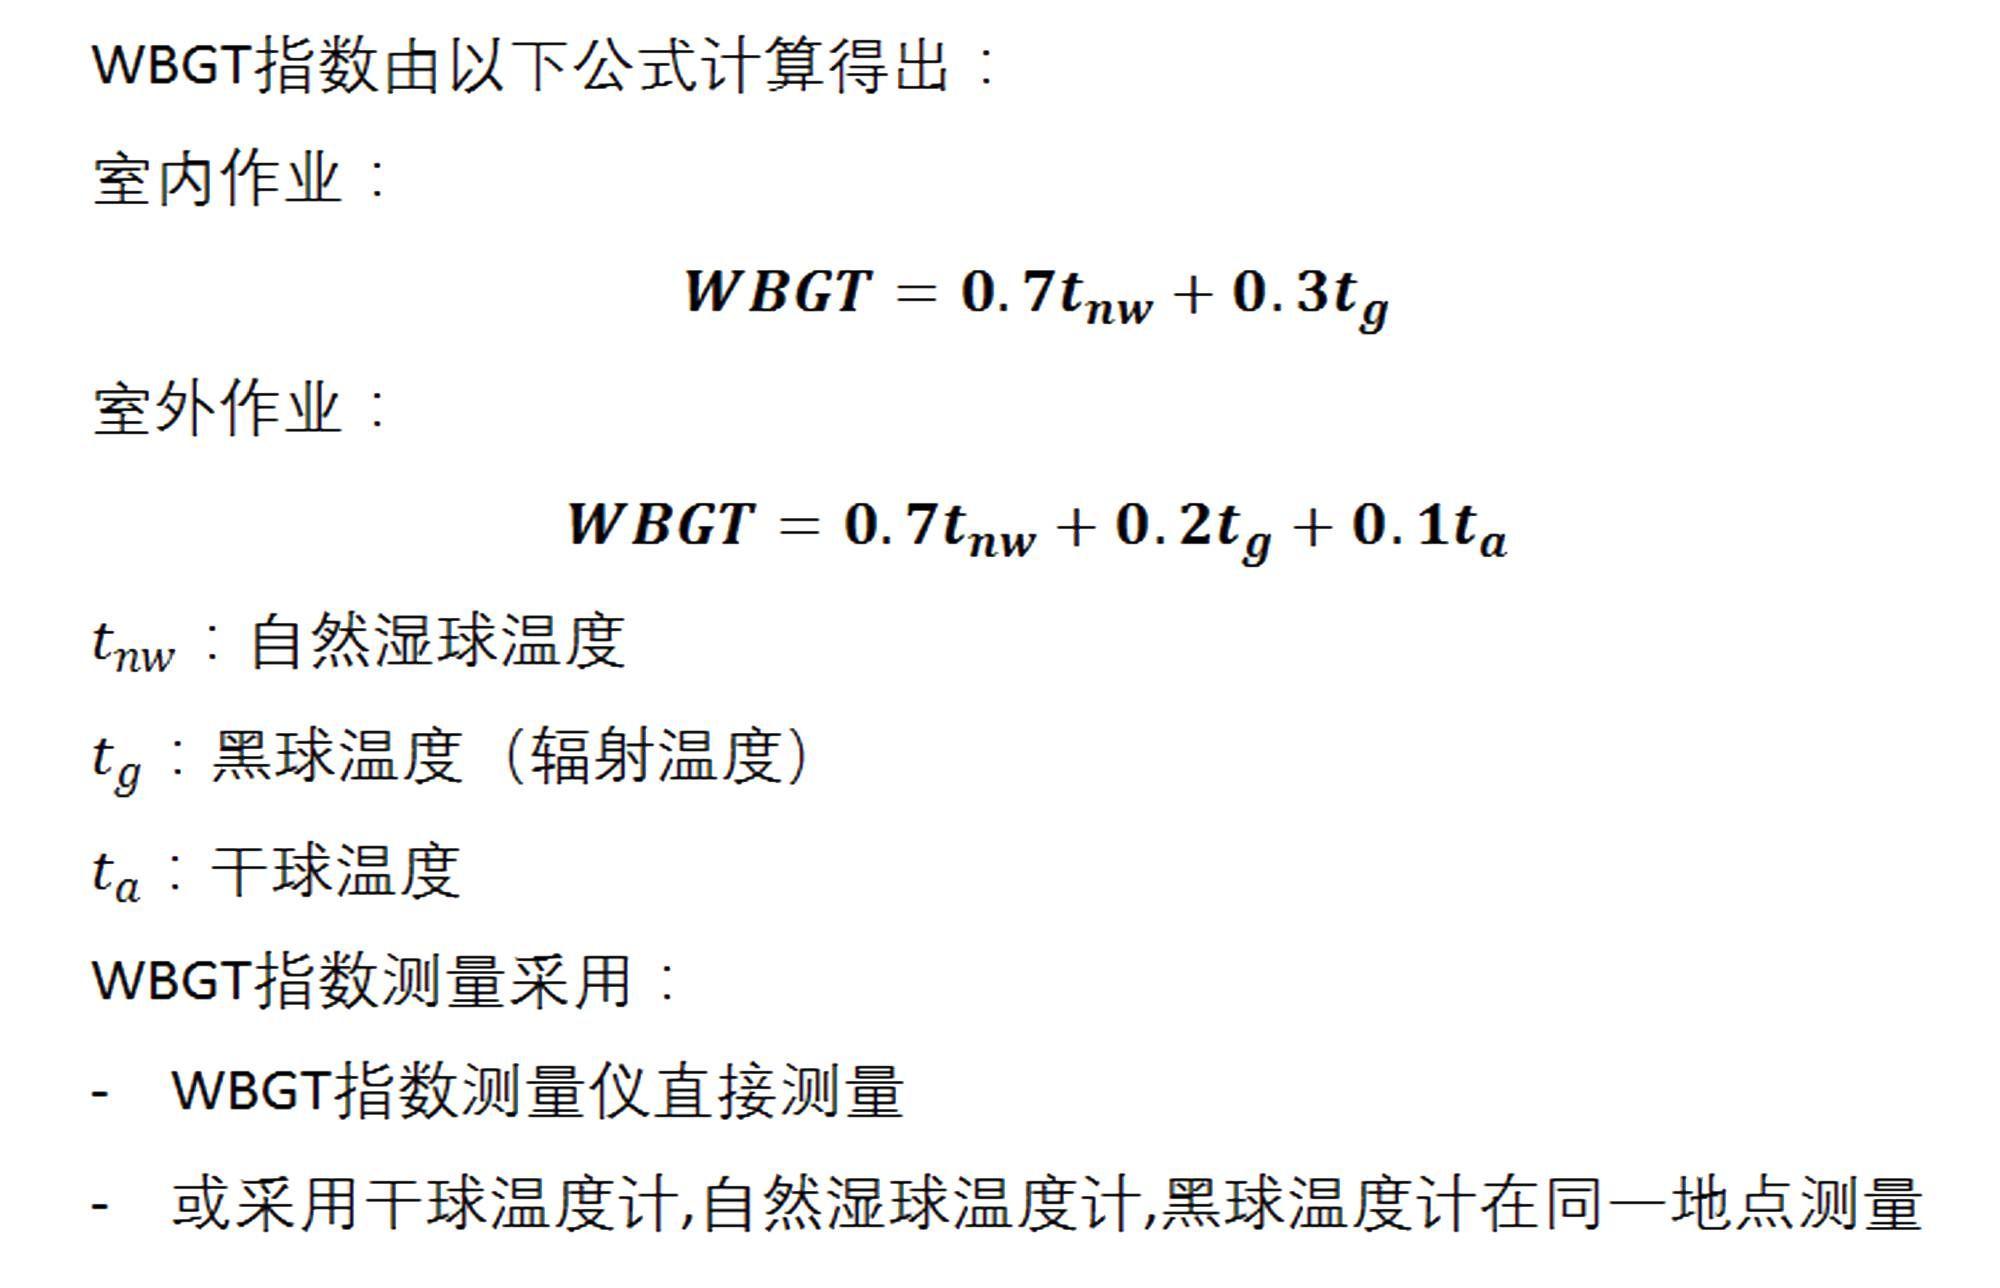 WBGT指数的计算公式